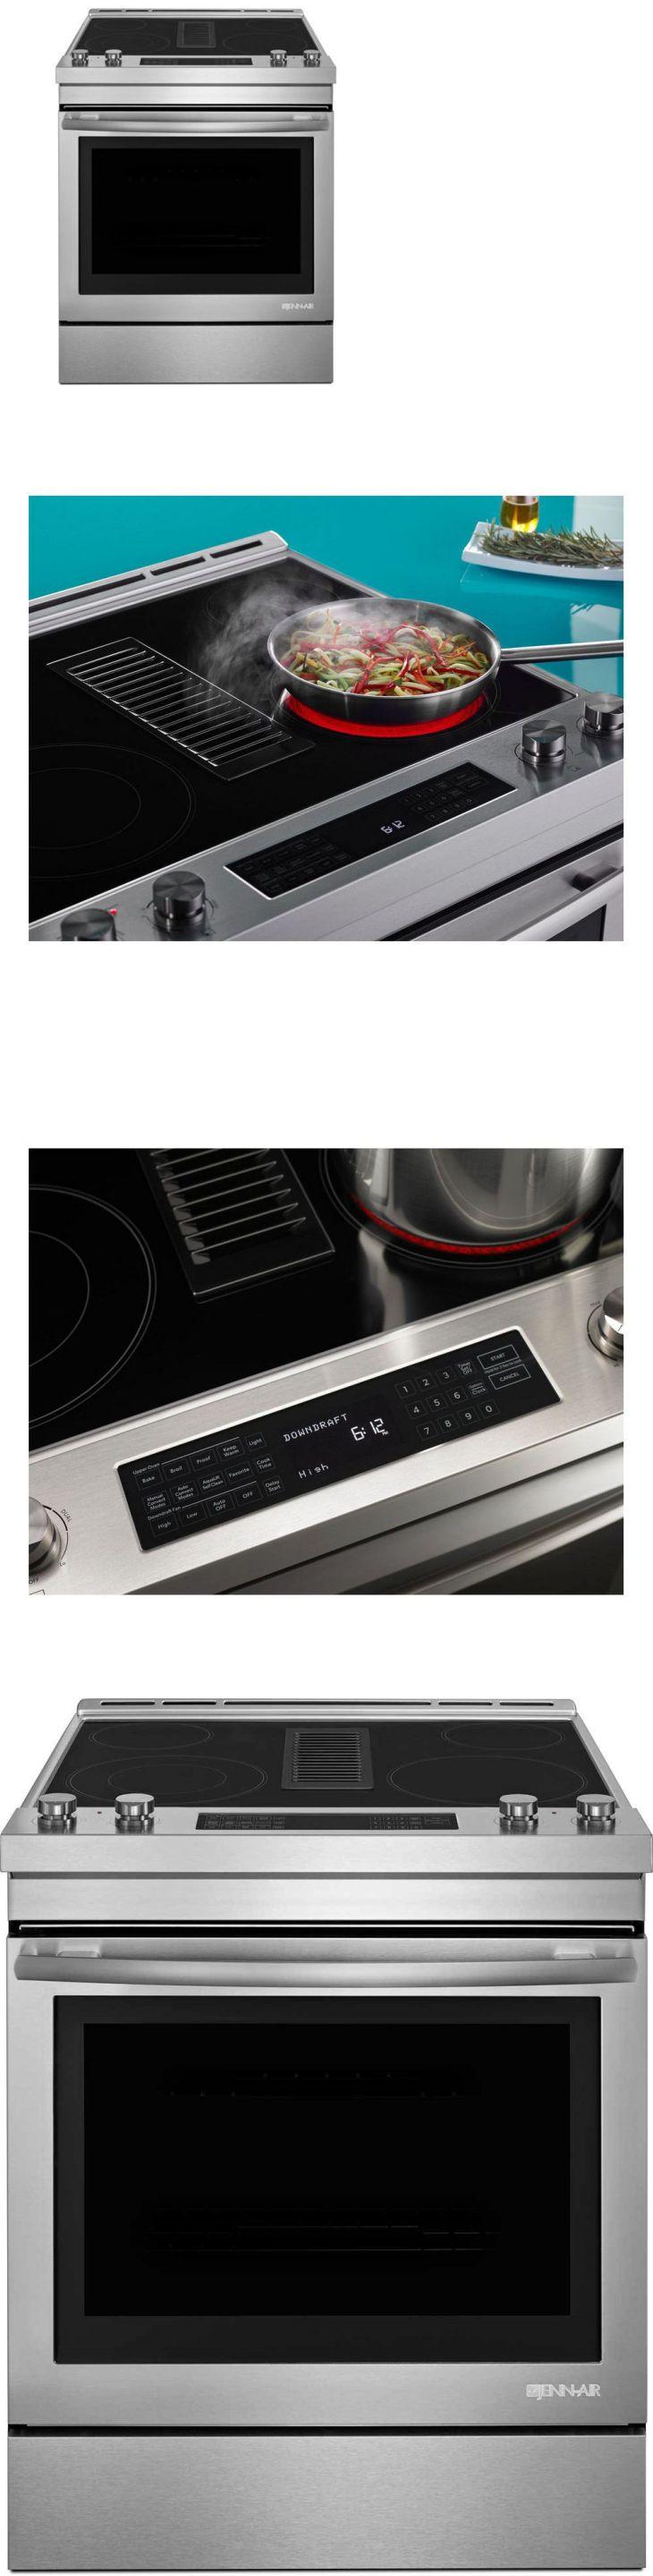 Major Appliances JennAir Ss SlideIn Electric Downdraft Range